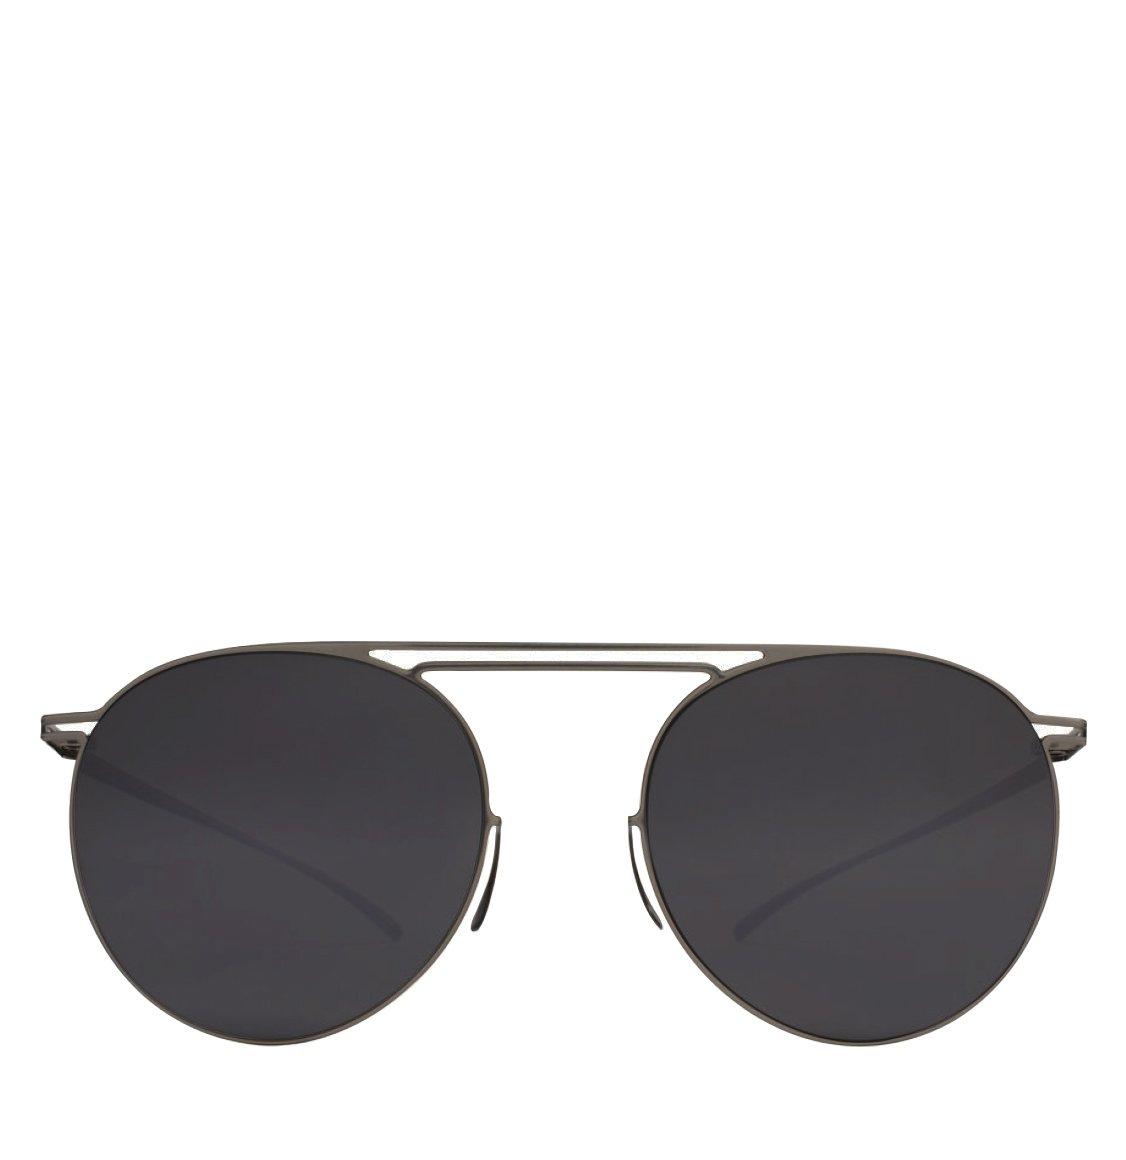 Mykita x Maison Martin Margiela Round-Frame Dark Silver Sunglasses